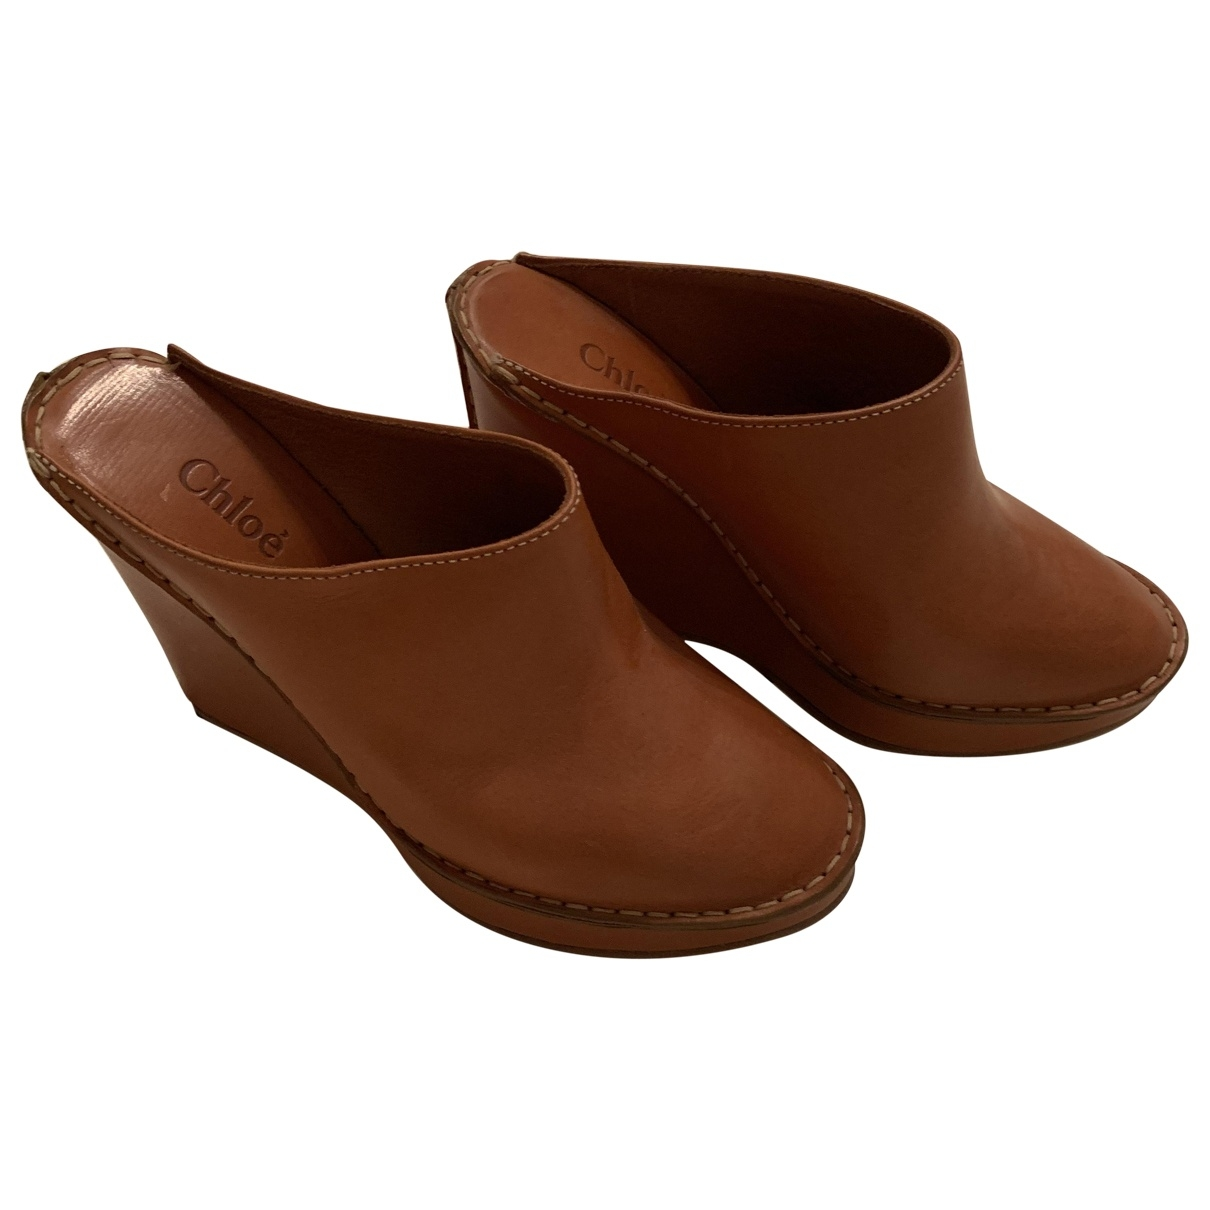 Chloé \N Camel Leather Sandals for Women 38 EU